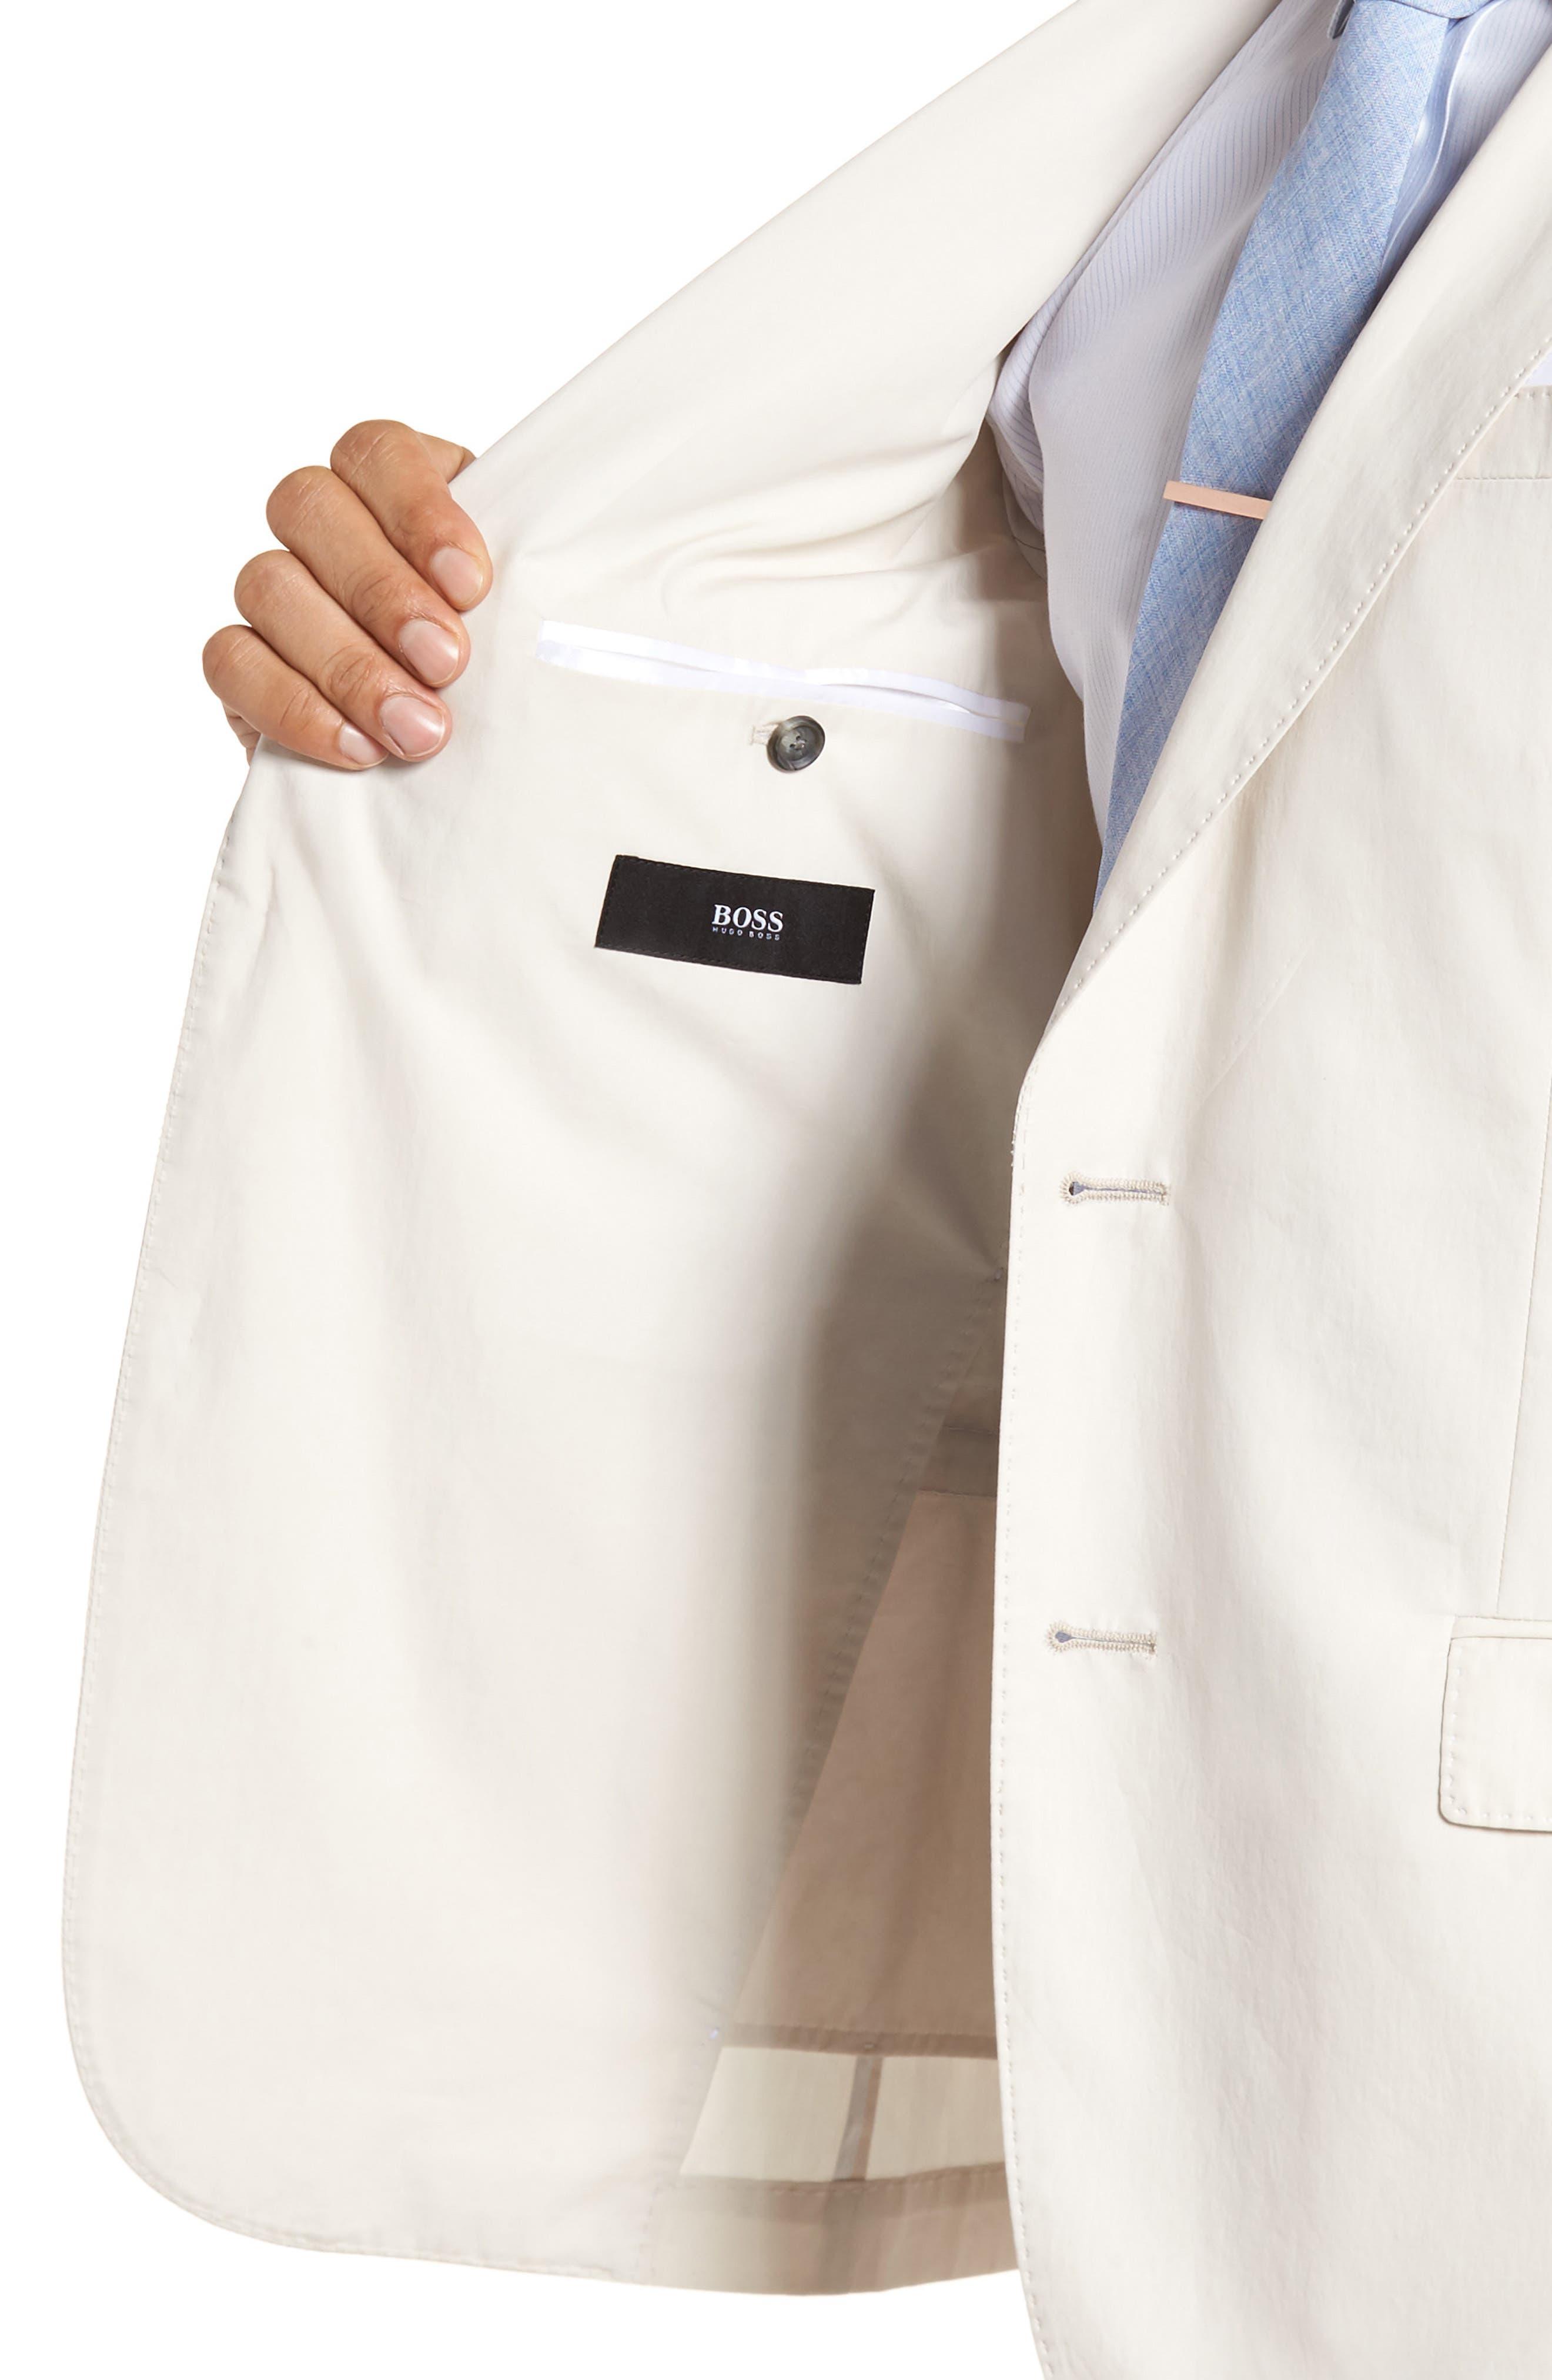 Nylen/Perry Trim Fit Solid Cotton Suit,                             Alternate thumbnail 4, color,                             Ivory